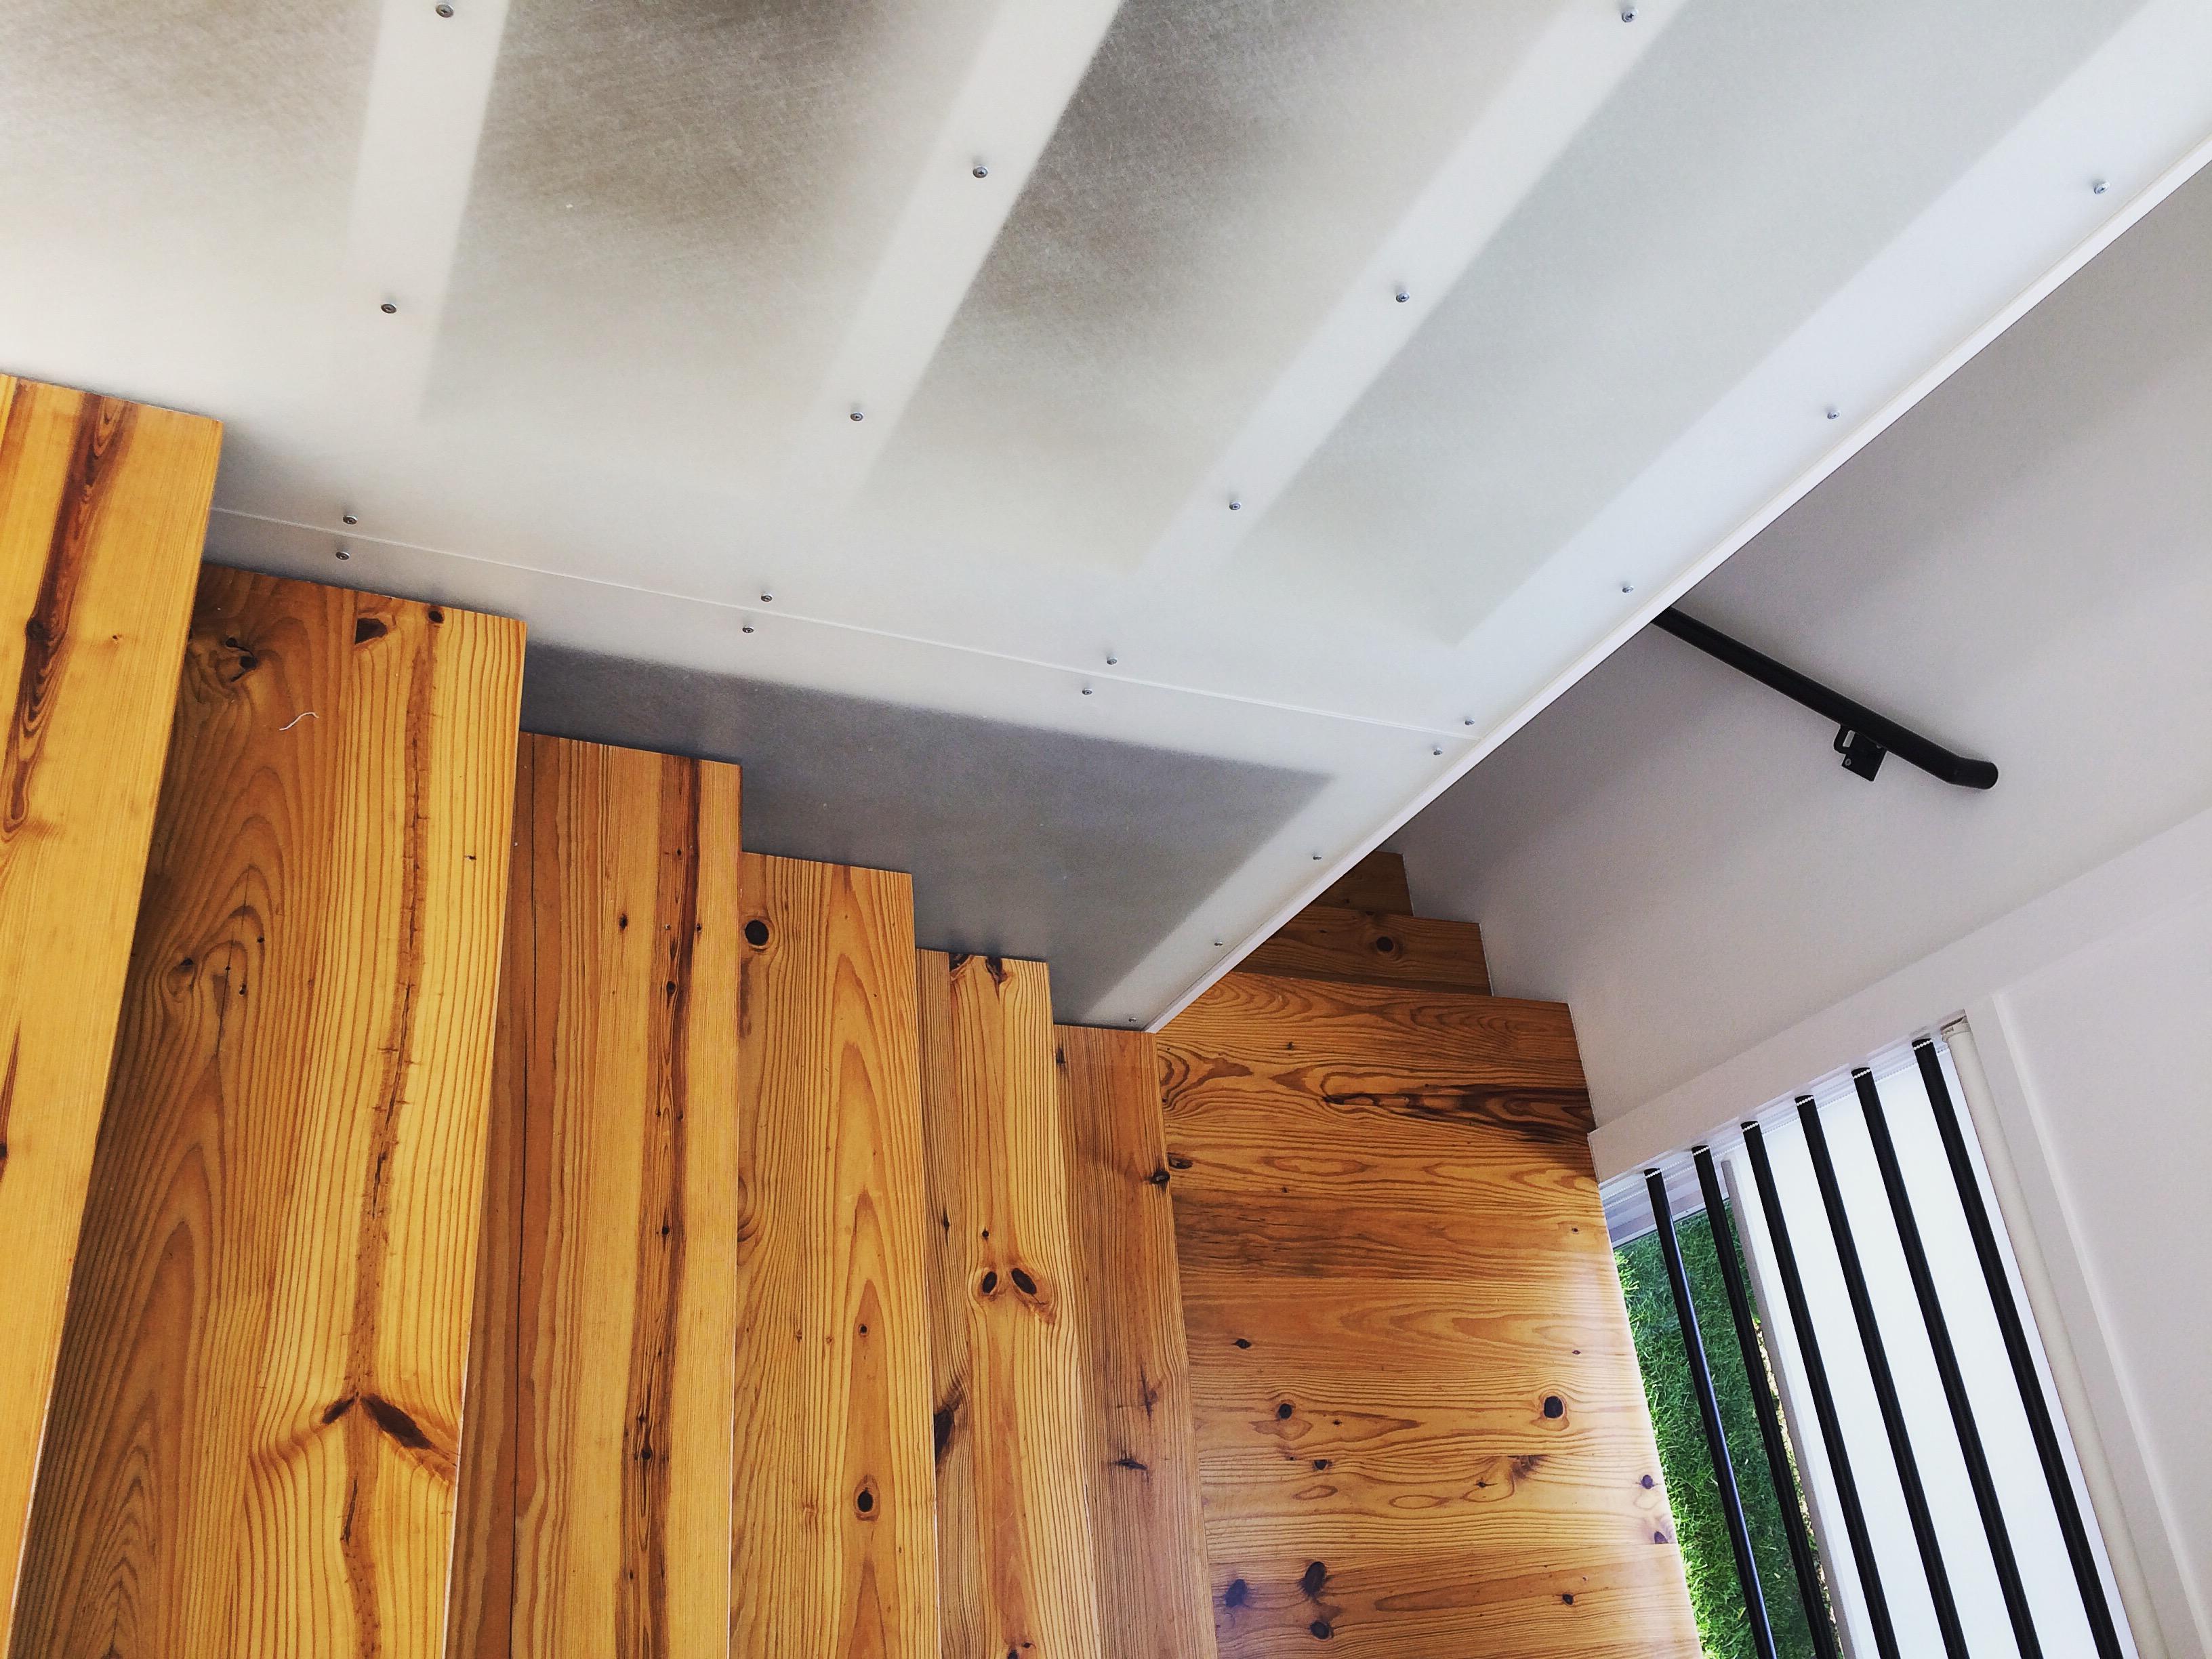 Classic Irvington Tudor Remodel - Master Stair Detail - Christopher Short, Architect, Indianapolis, HAUS Architecture